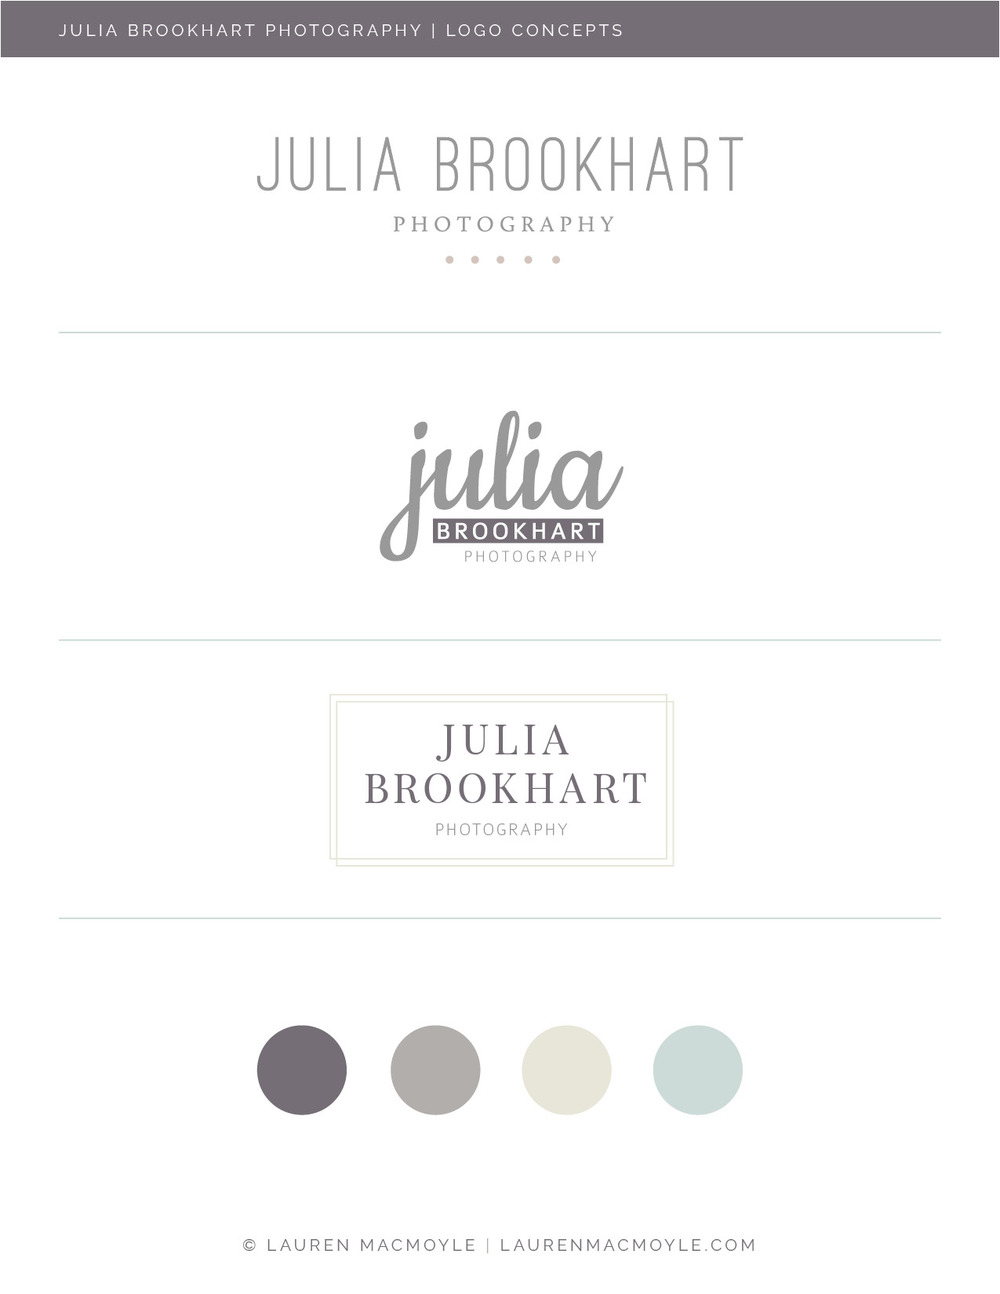 Studio Photography Branding and Logo Design   Lauren MacMoyle   Graphic Design